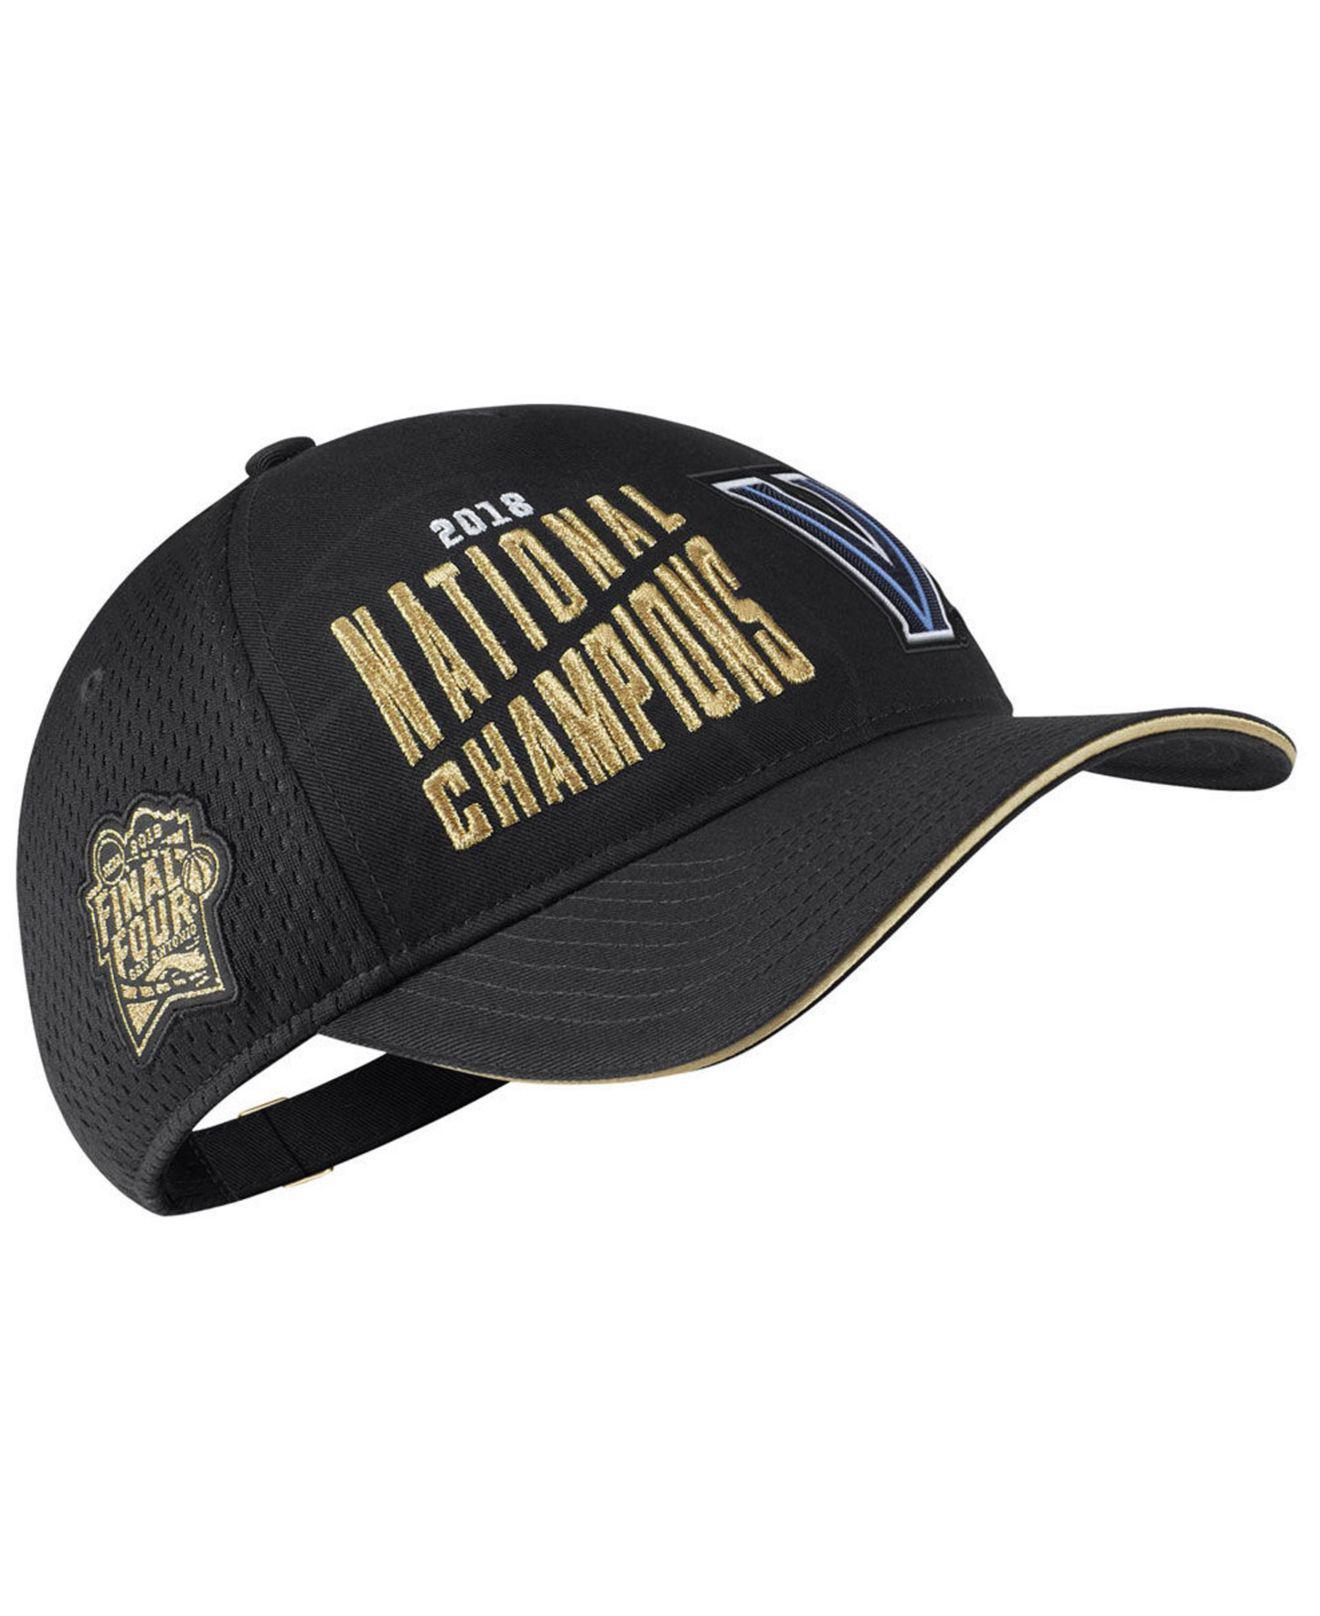 6cdbe1521f4 Lyst - Nike Villanova Wildcats Basketball National Champs Cap in ...